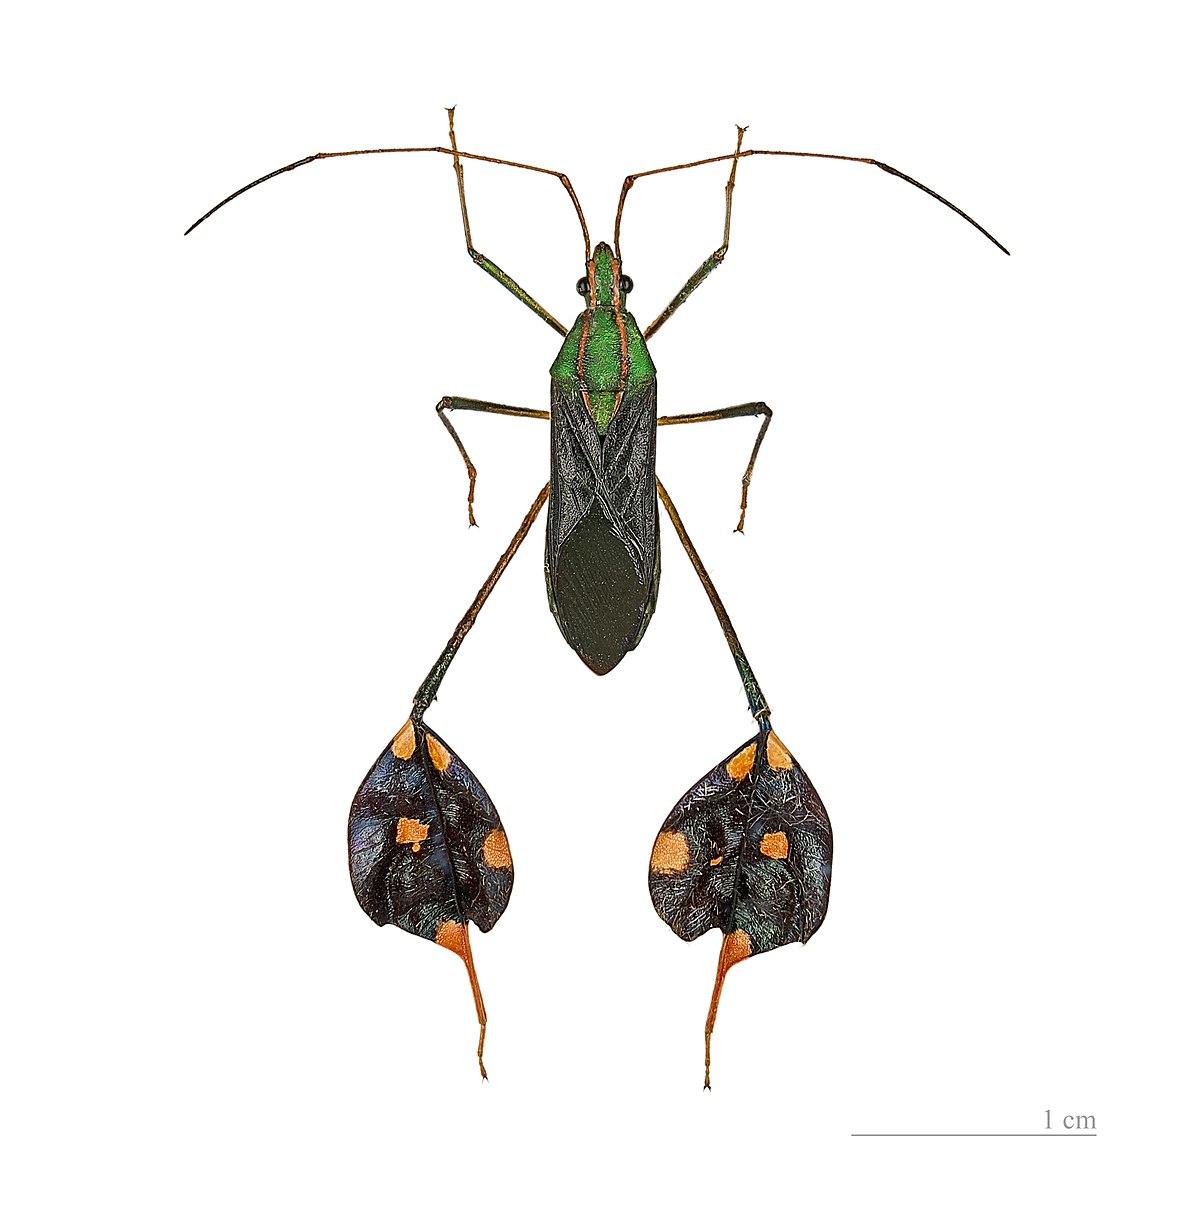 endemică de insecte